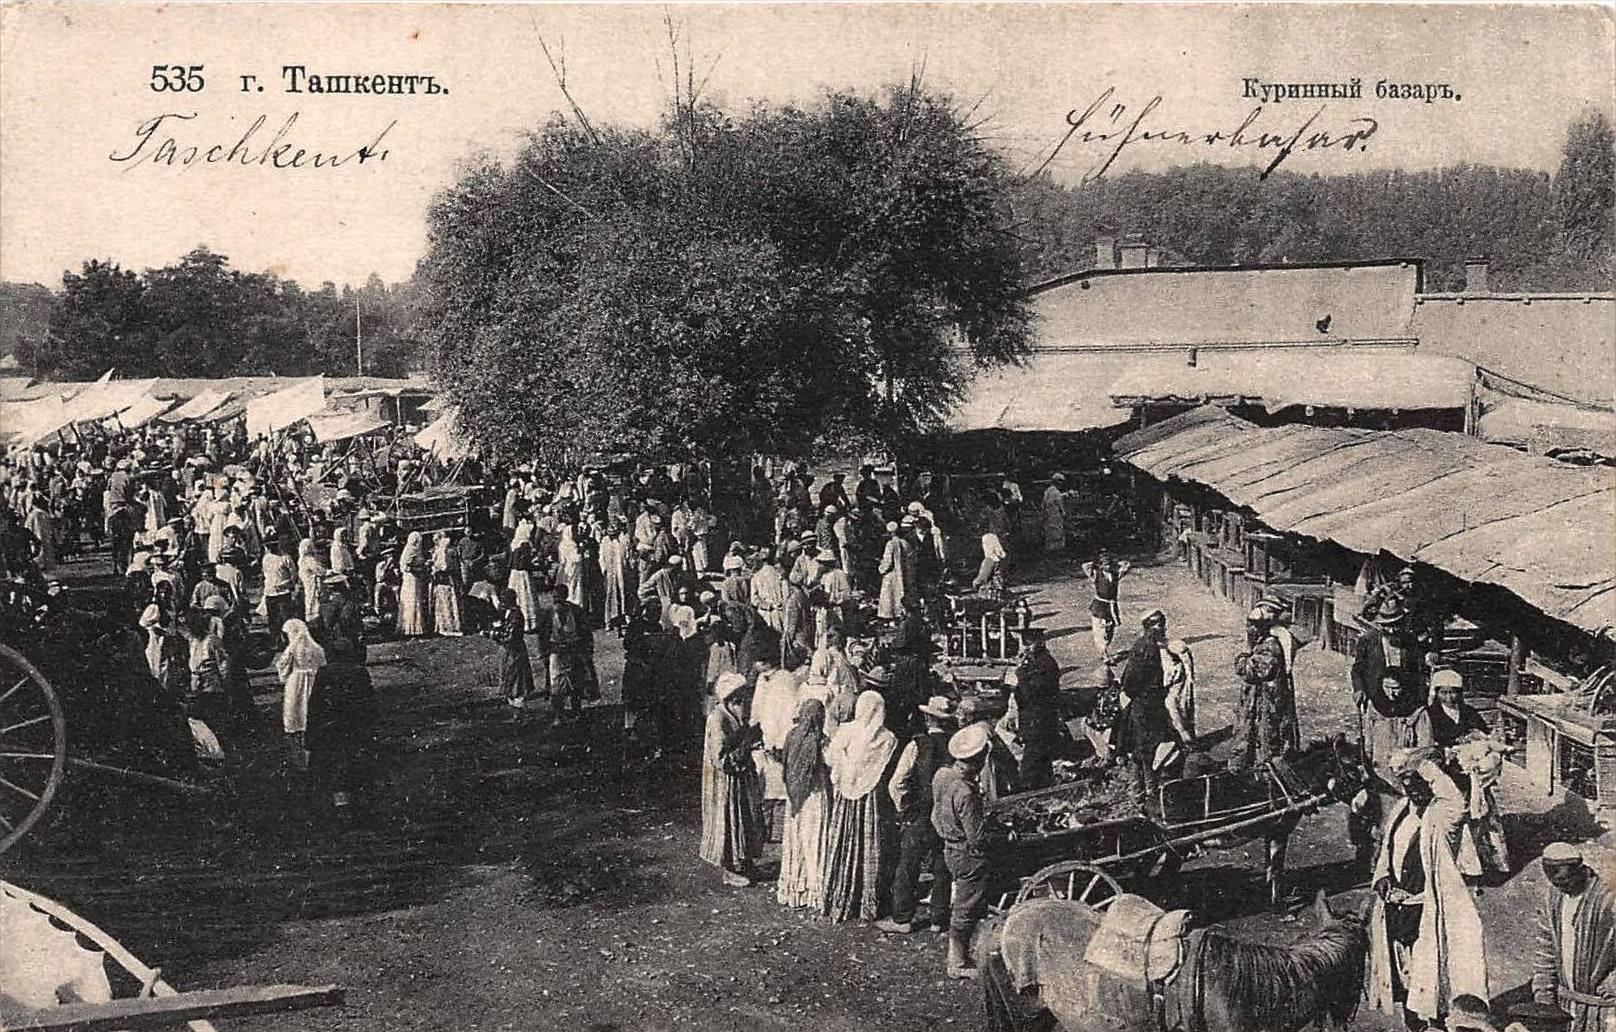 Куриный базар